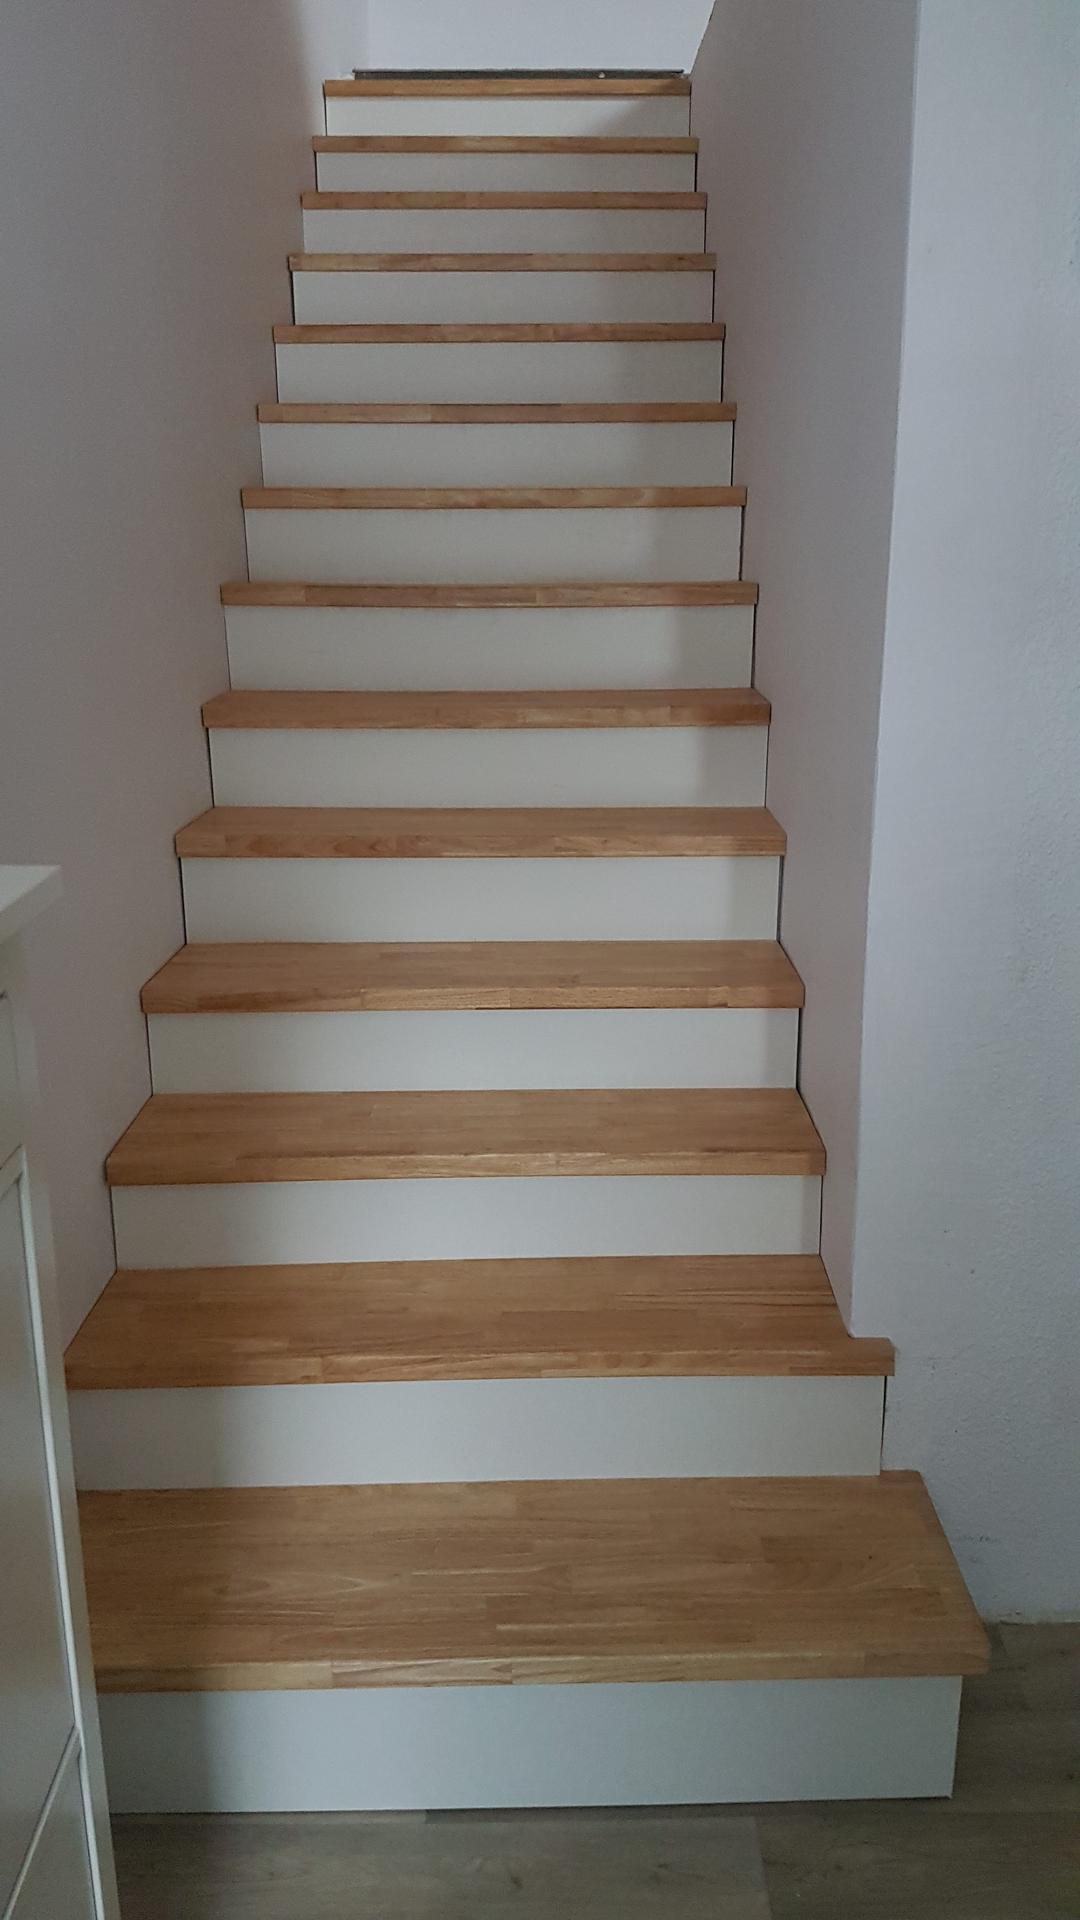 Rekonstrukce betonovych schodů - zdi jsme srovnali sadrokartonem, schody delal táta truhlař. Spárovka hevea,natrena protiskluz. voskovym osmo olejem. podstupnice lepena preklizka